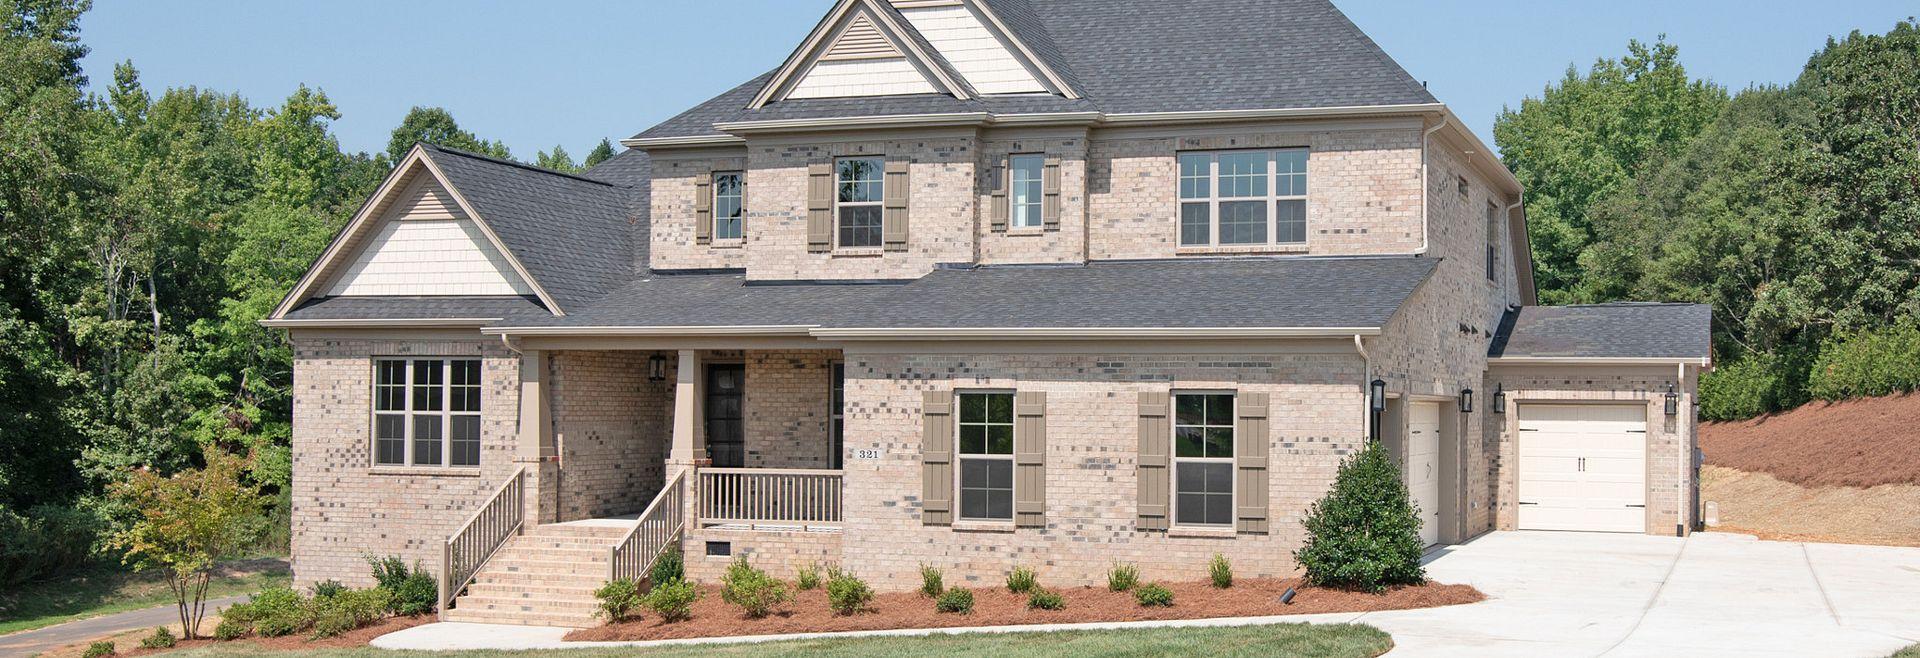 Sycamore Exterior B 4-sides brick